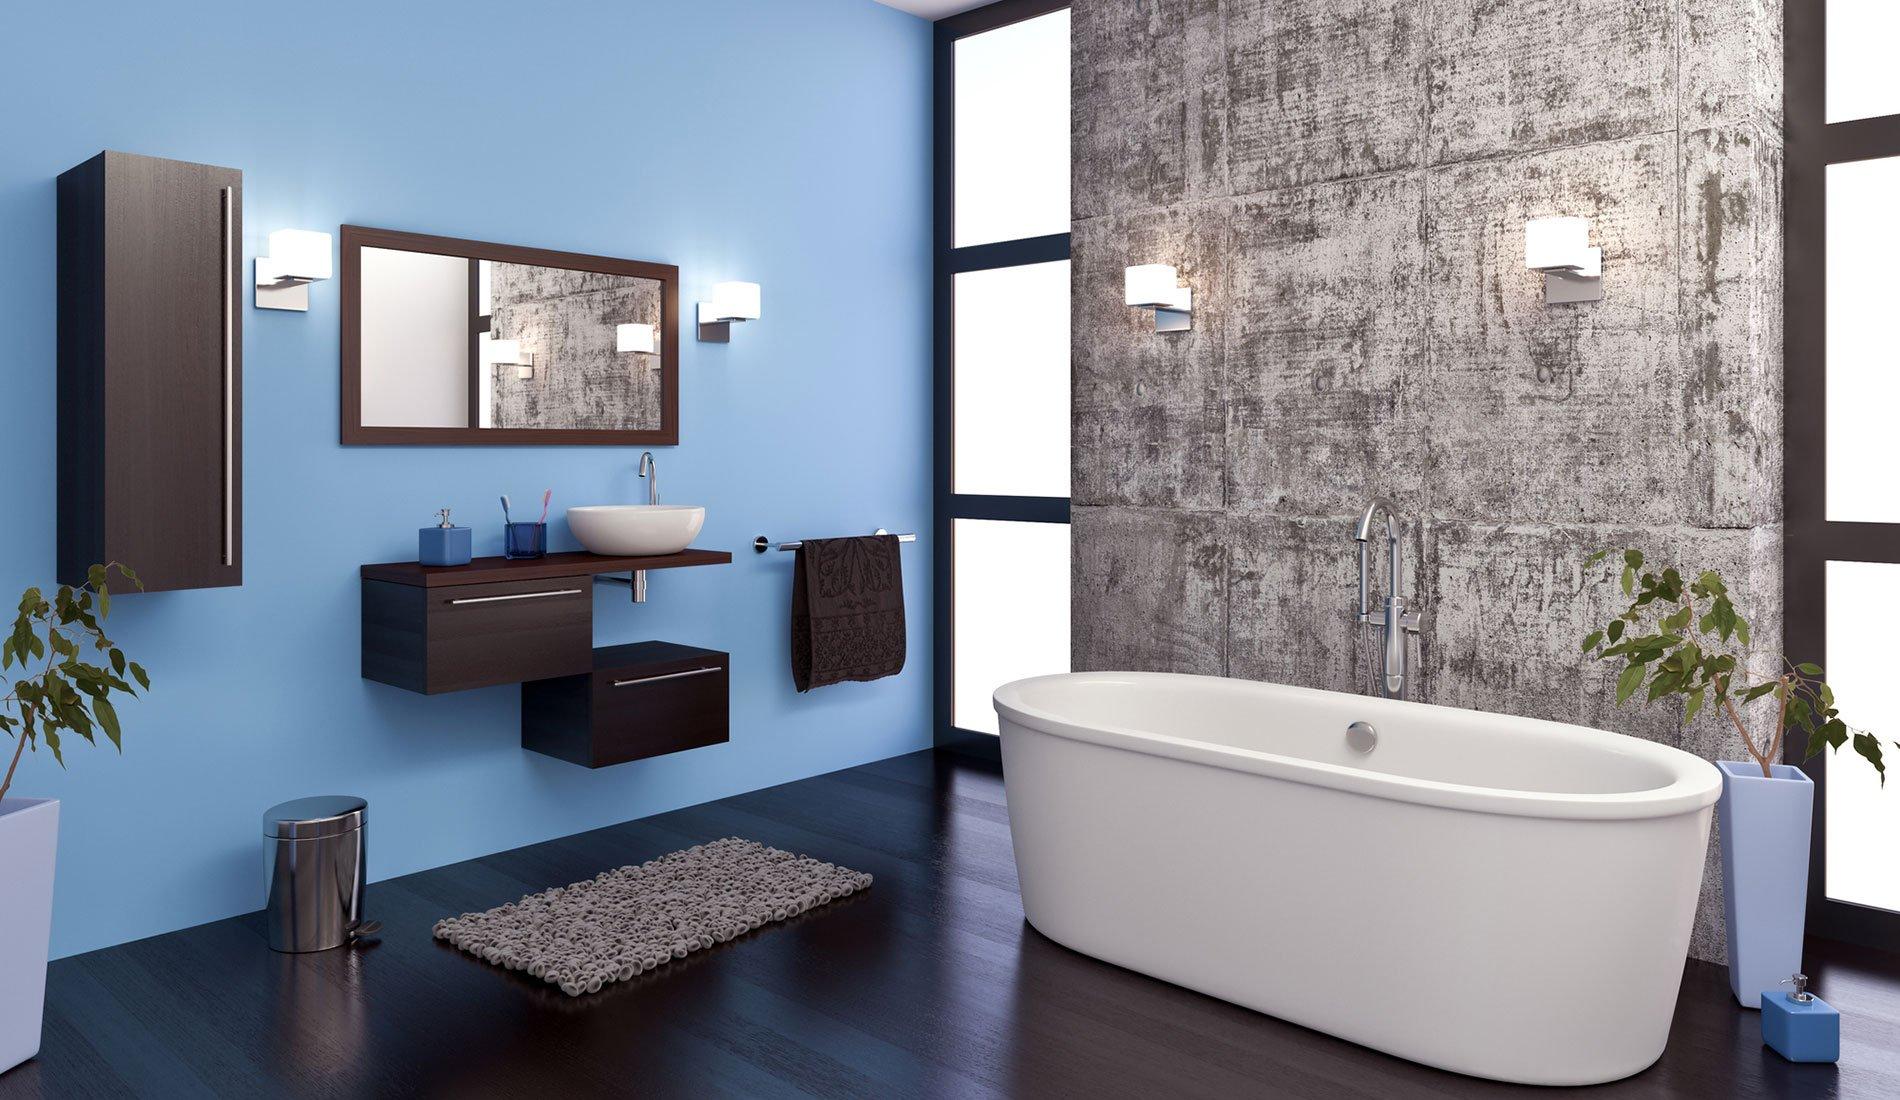 Home Renovations Company Abilene, TX | Home Remodeling Companies